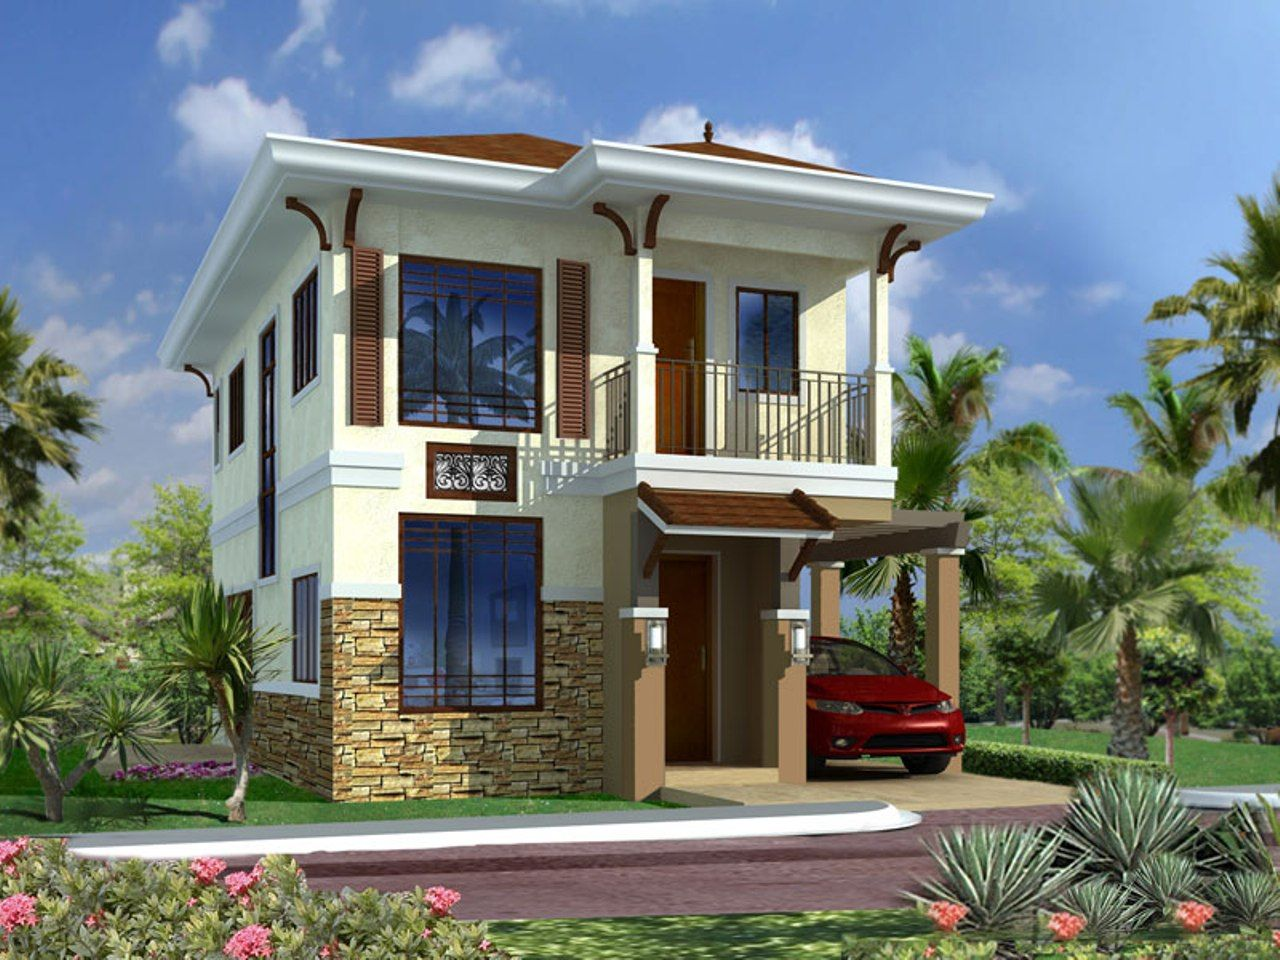 Fachada de casas de dos plantas sencillas buscar con - Casas de dos plantas ...